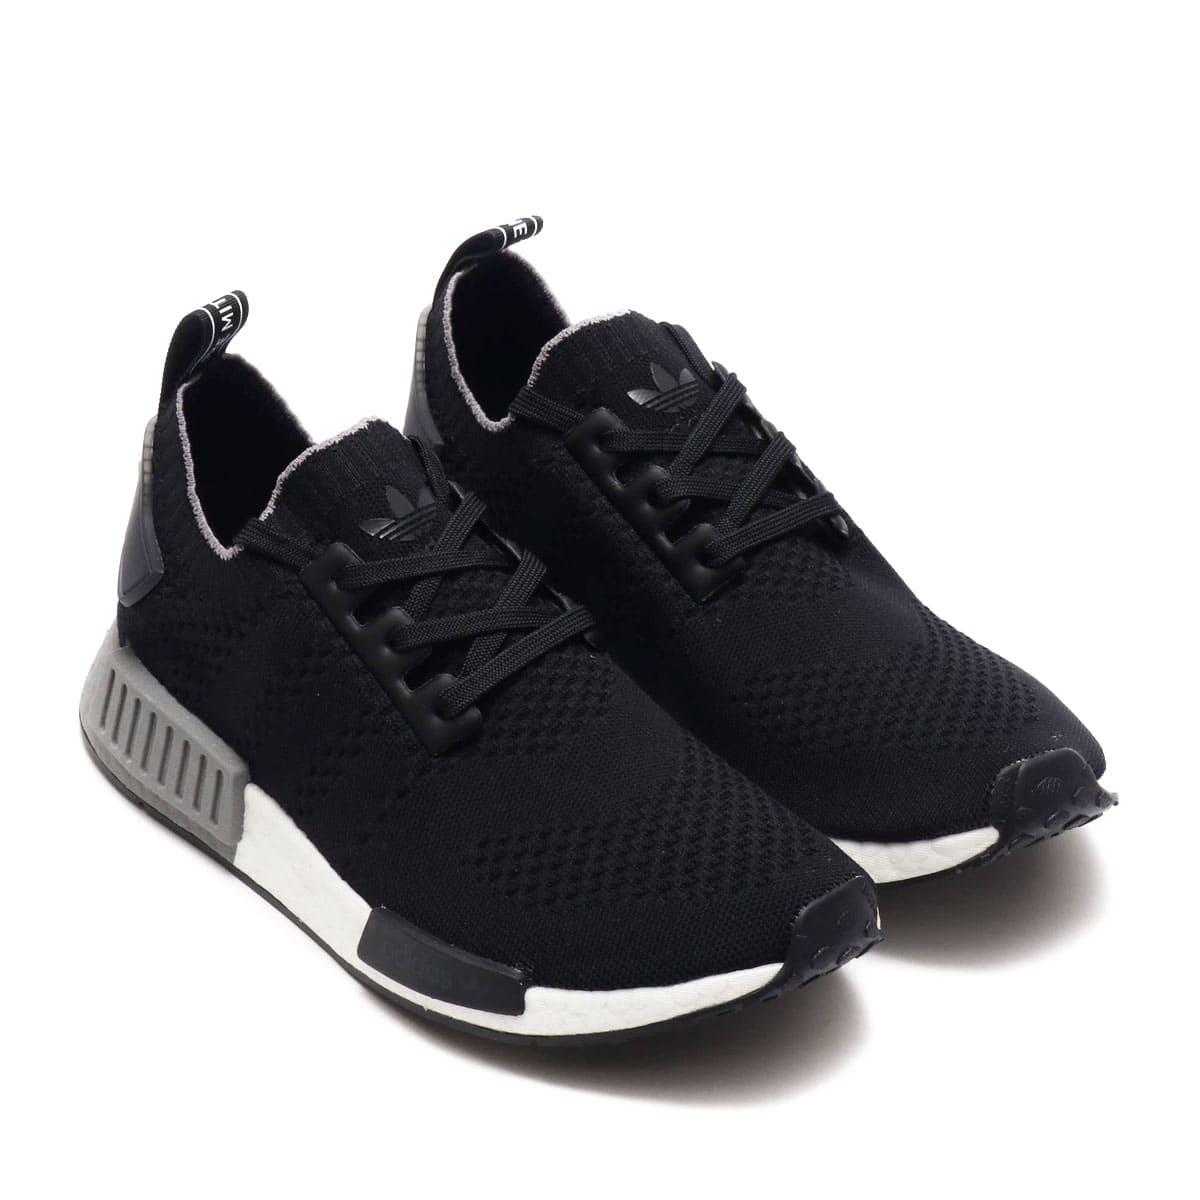 adidas NMD_R1 PK CORE BLACK/CORE BLACK/GREY THREE 19FW-I_photo_large